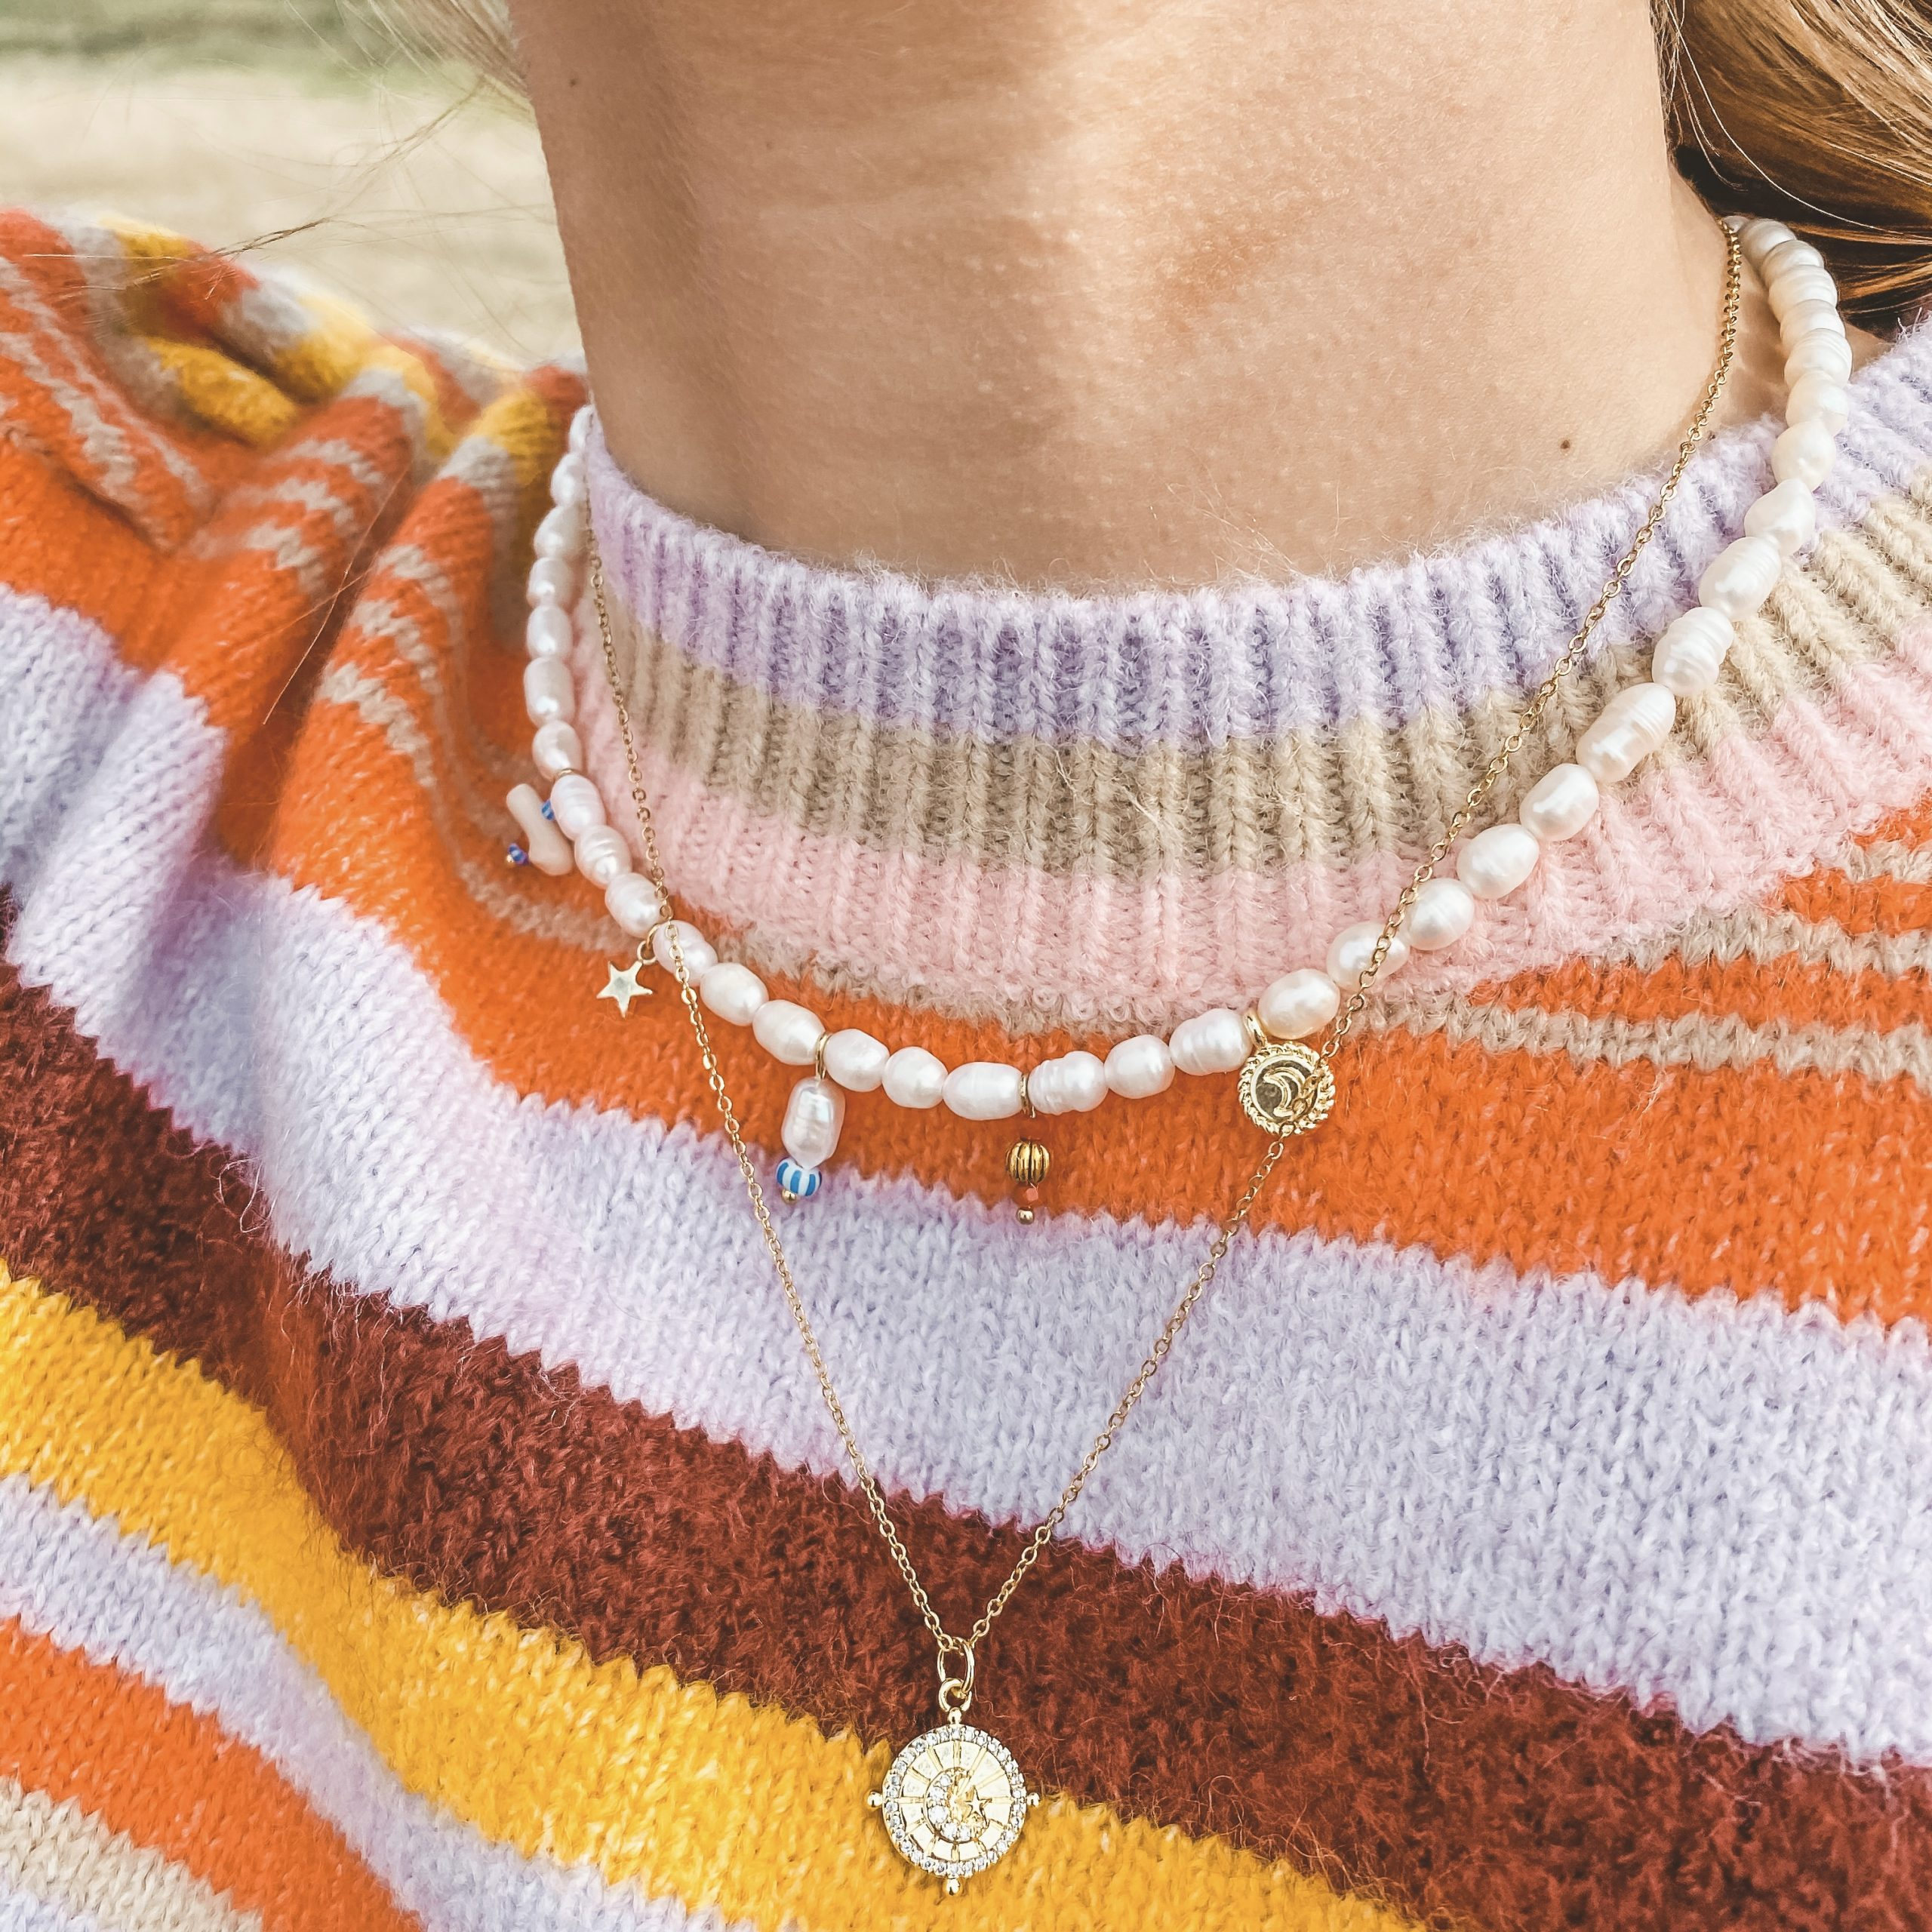 Pearl choker charms